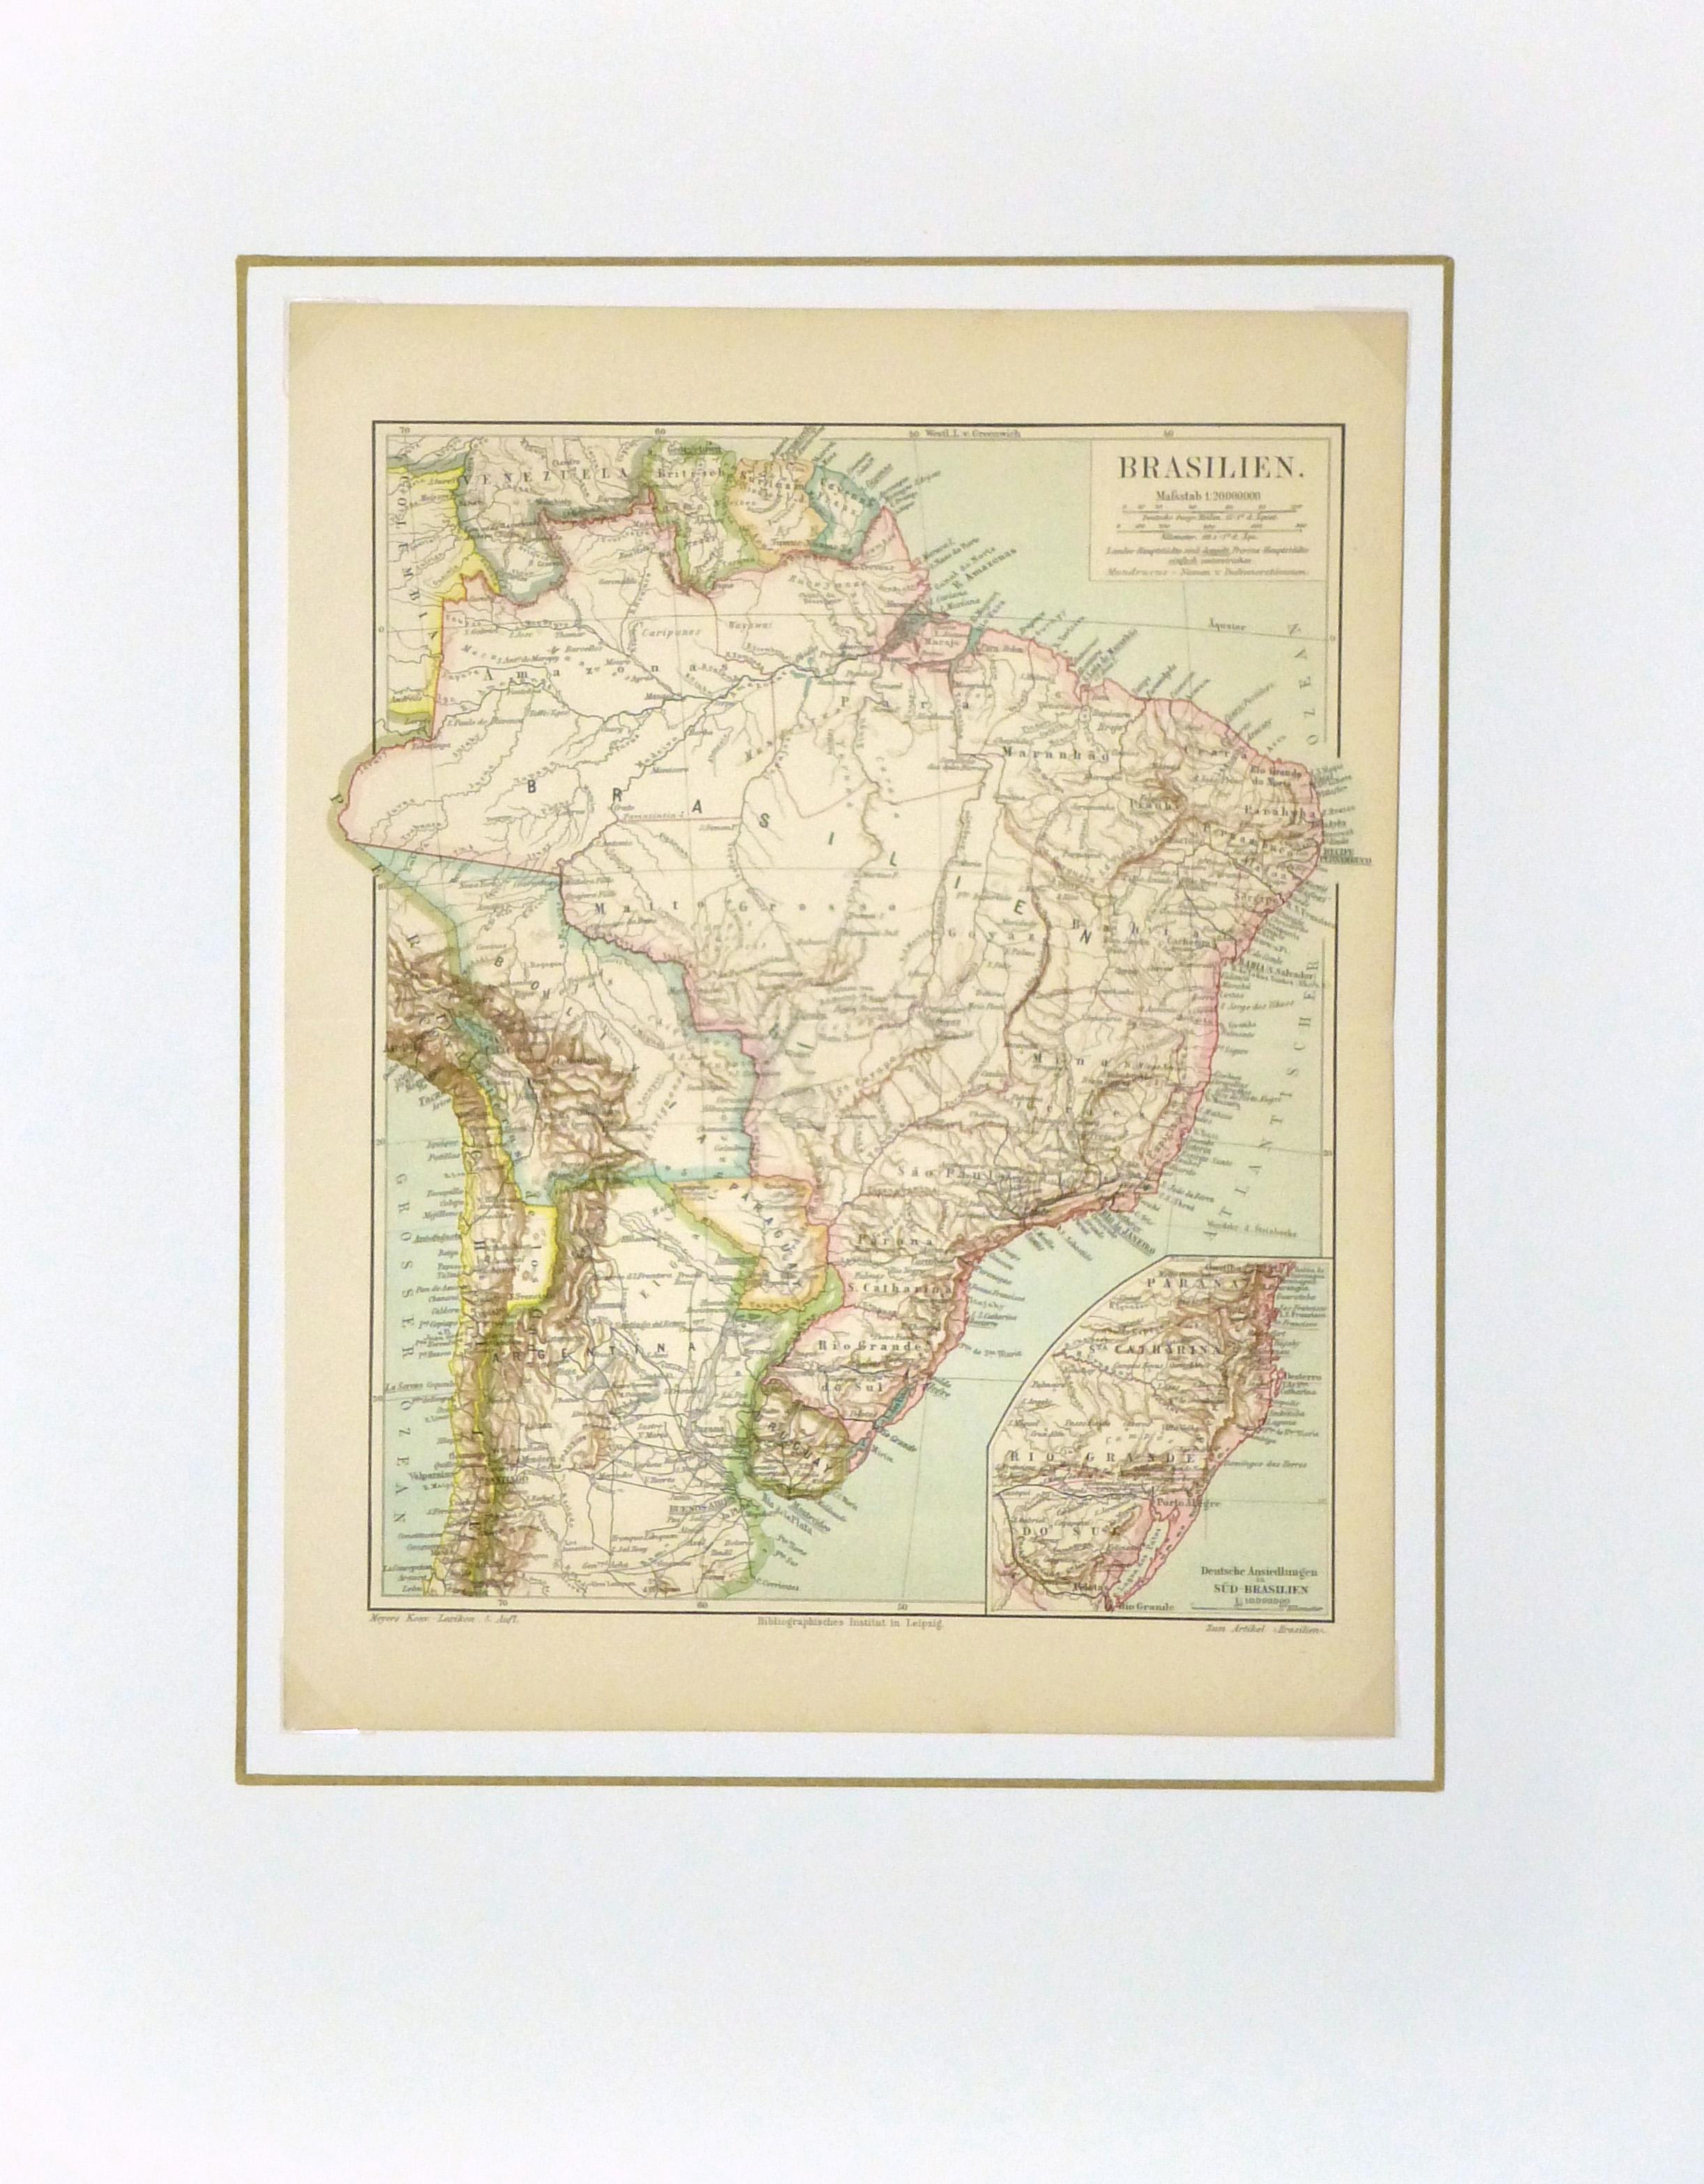 Brazil Map, Circa 1880-matted-8808K